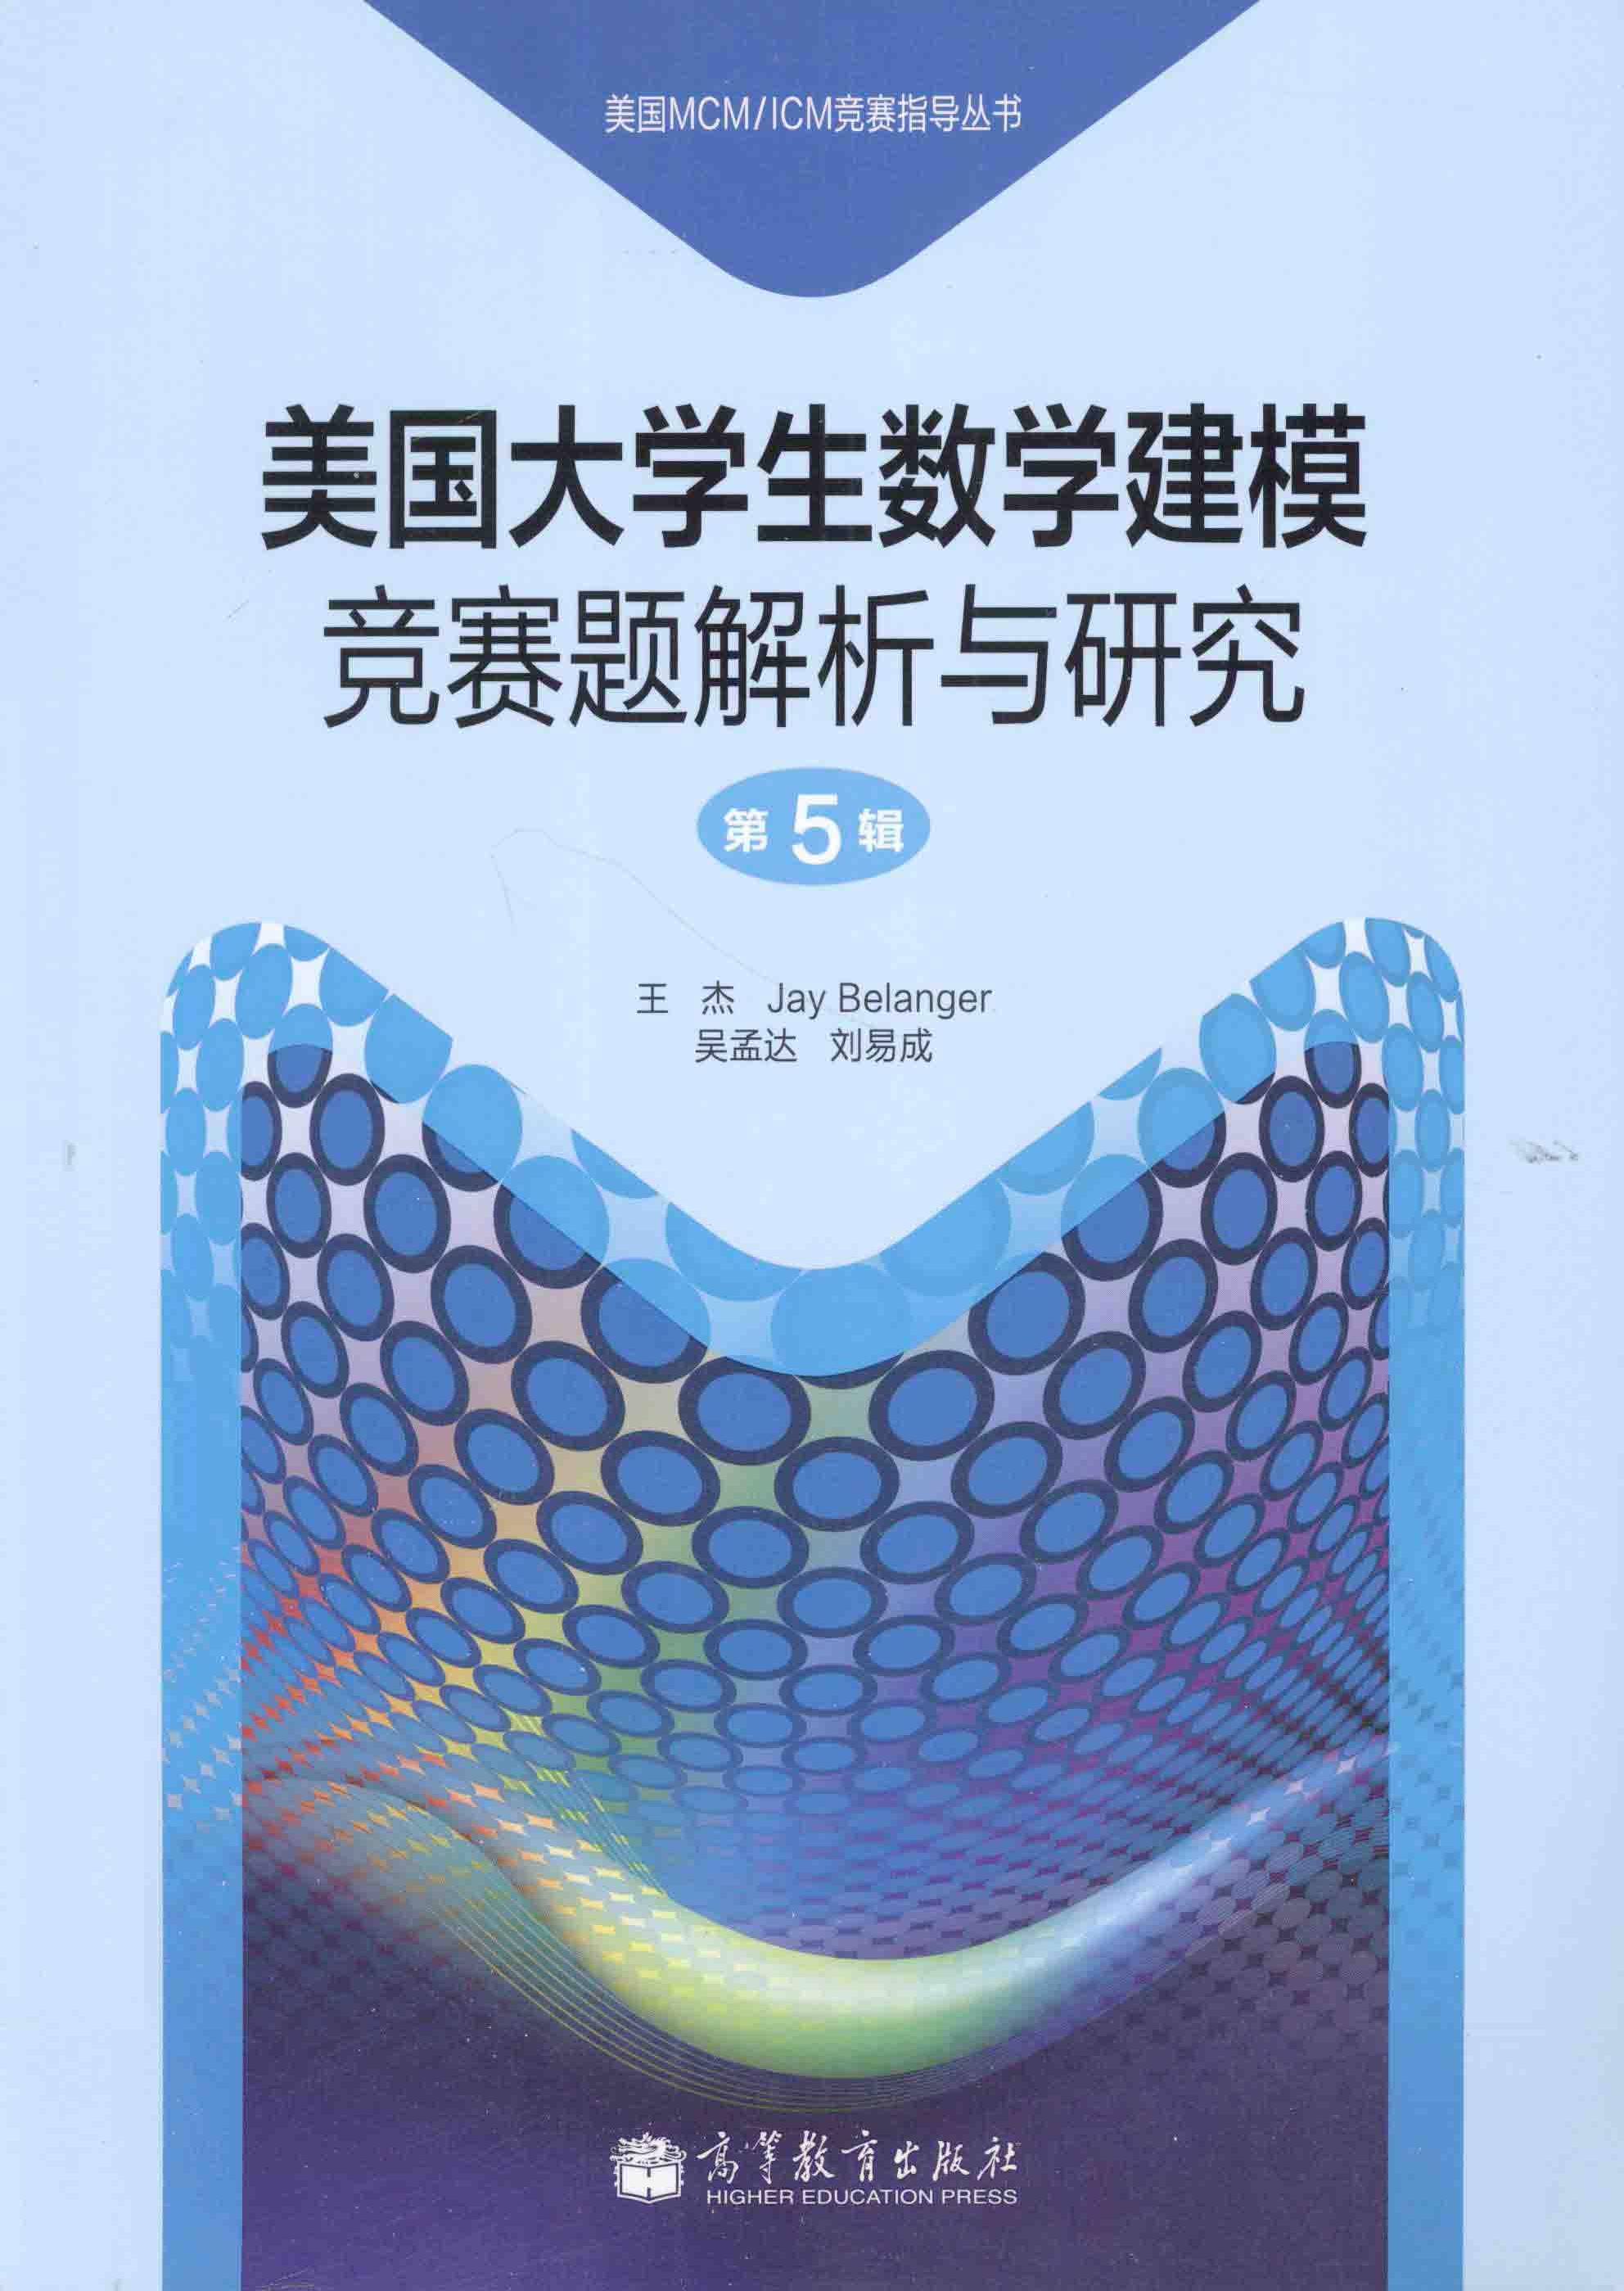 HiMCM/MCM/ICM美国数学建模